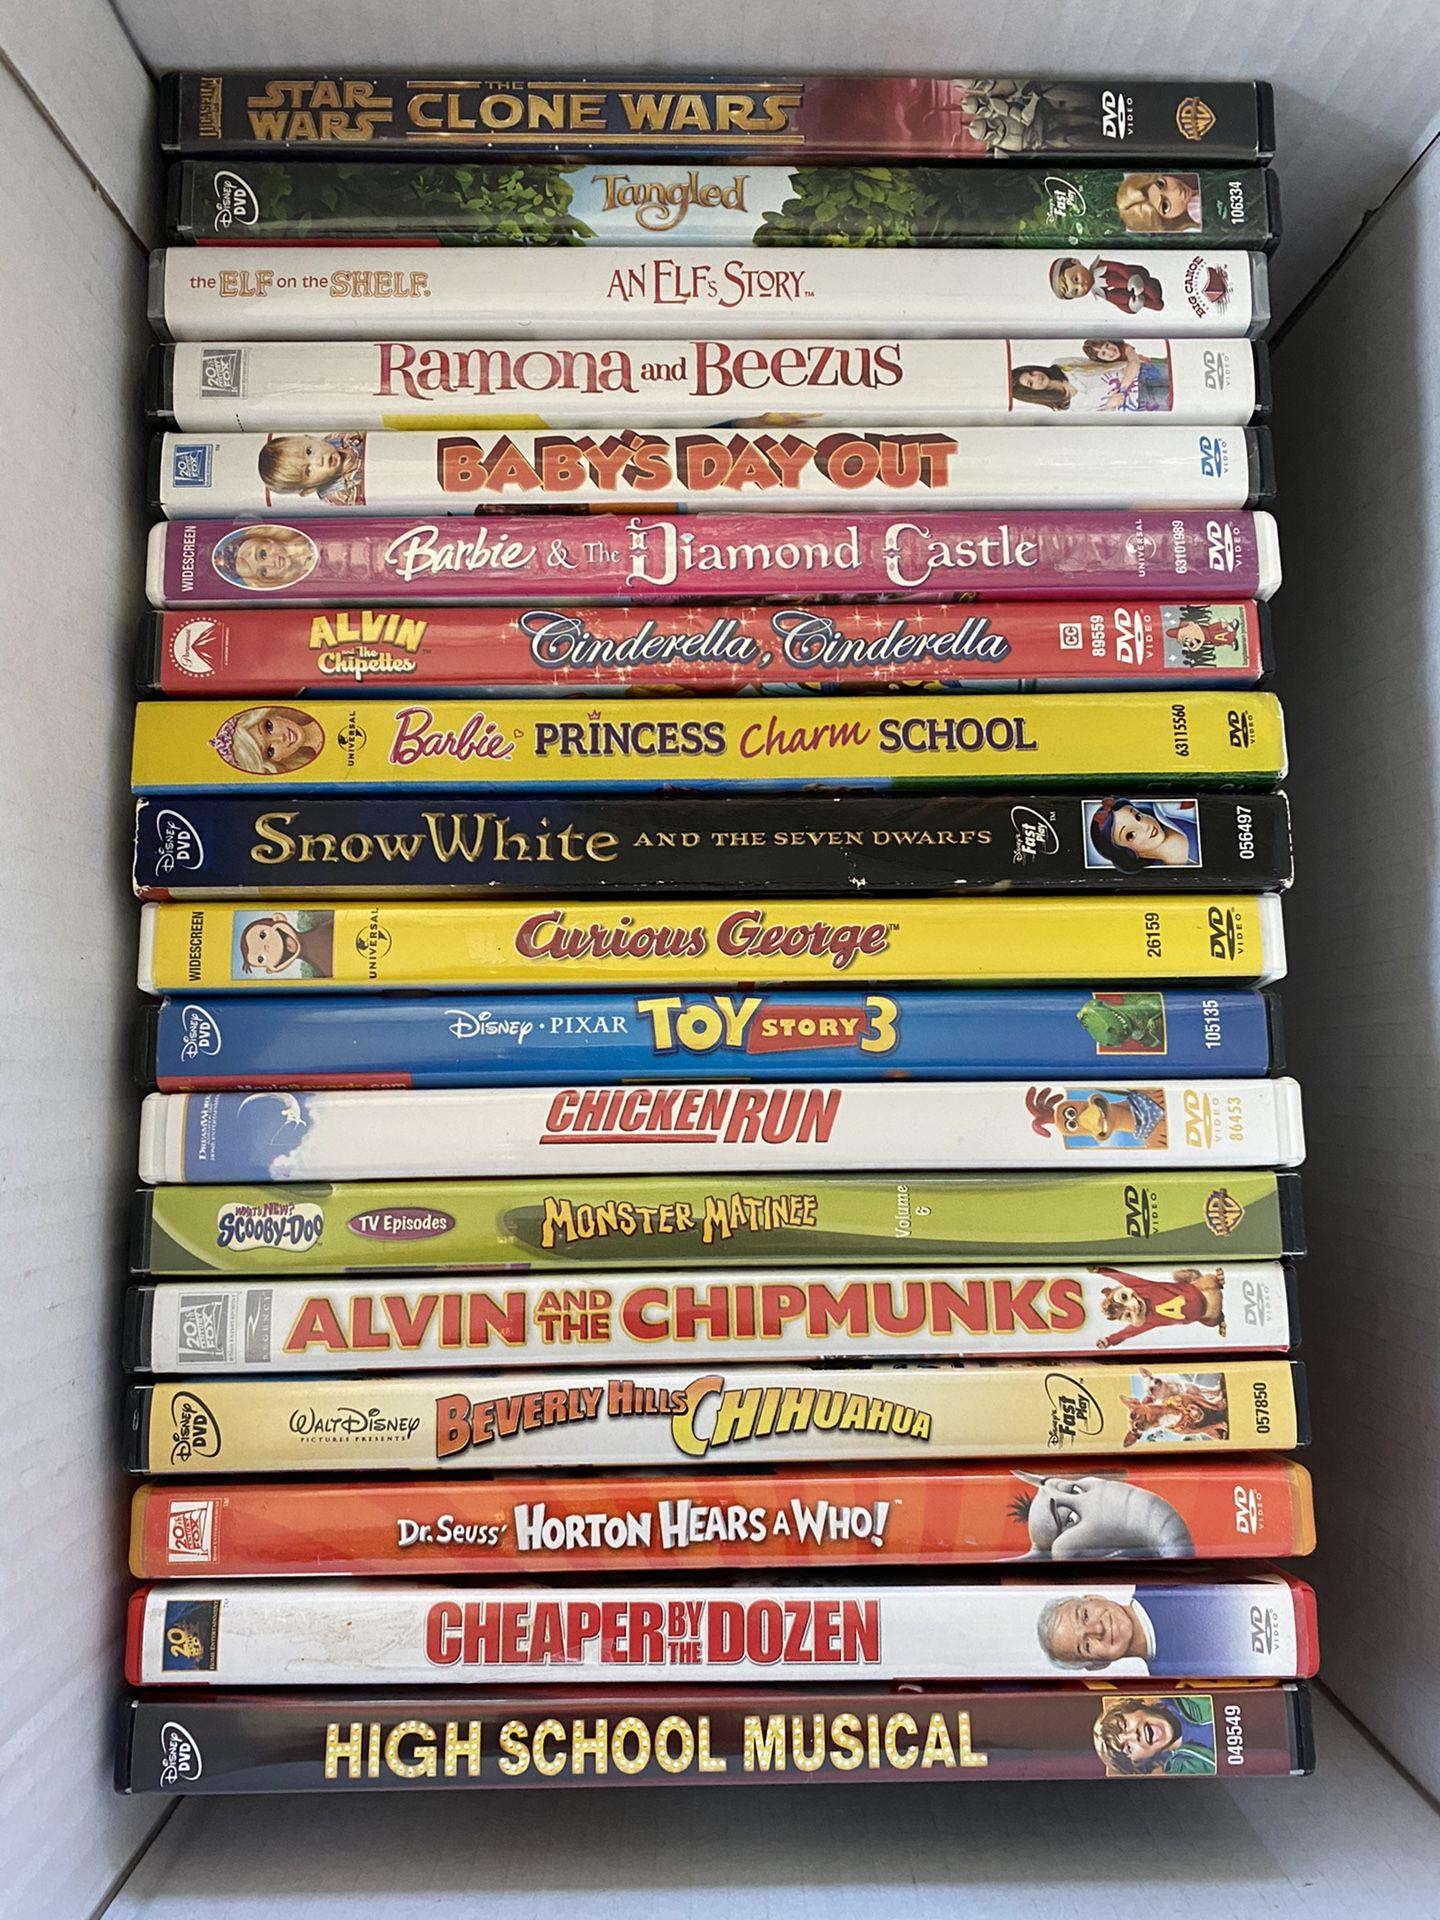 Disney Movies & More + DVD Player